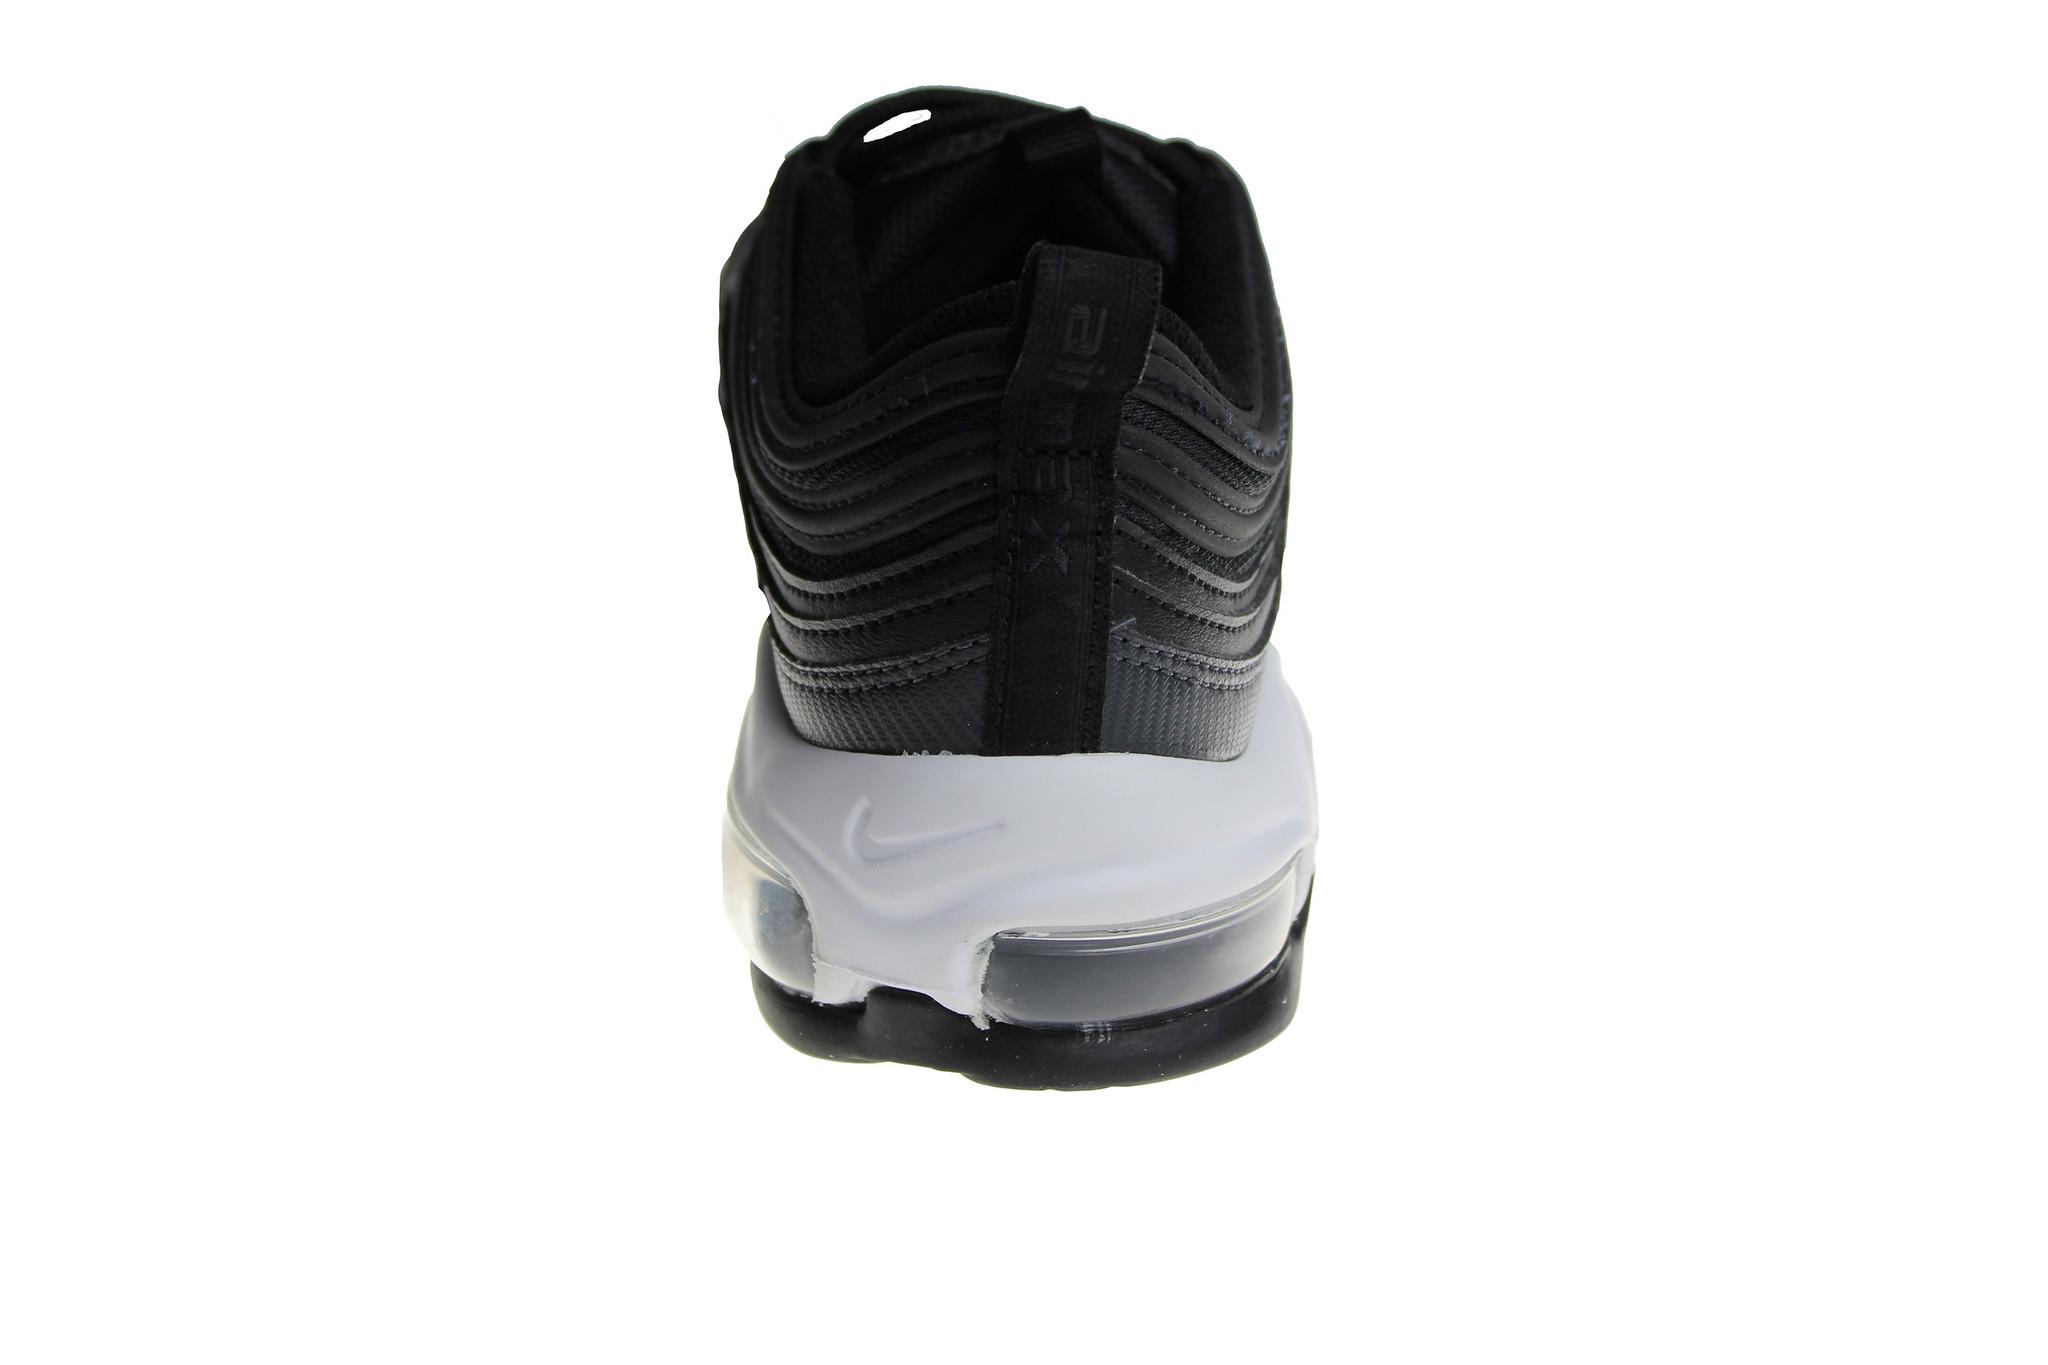 Nike Air Max 97 EP (GS) ZwartAntracietWit BV0051 001 Junioren Sneakers